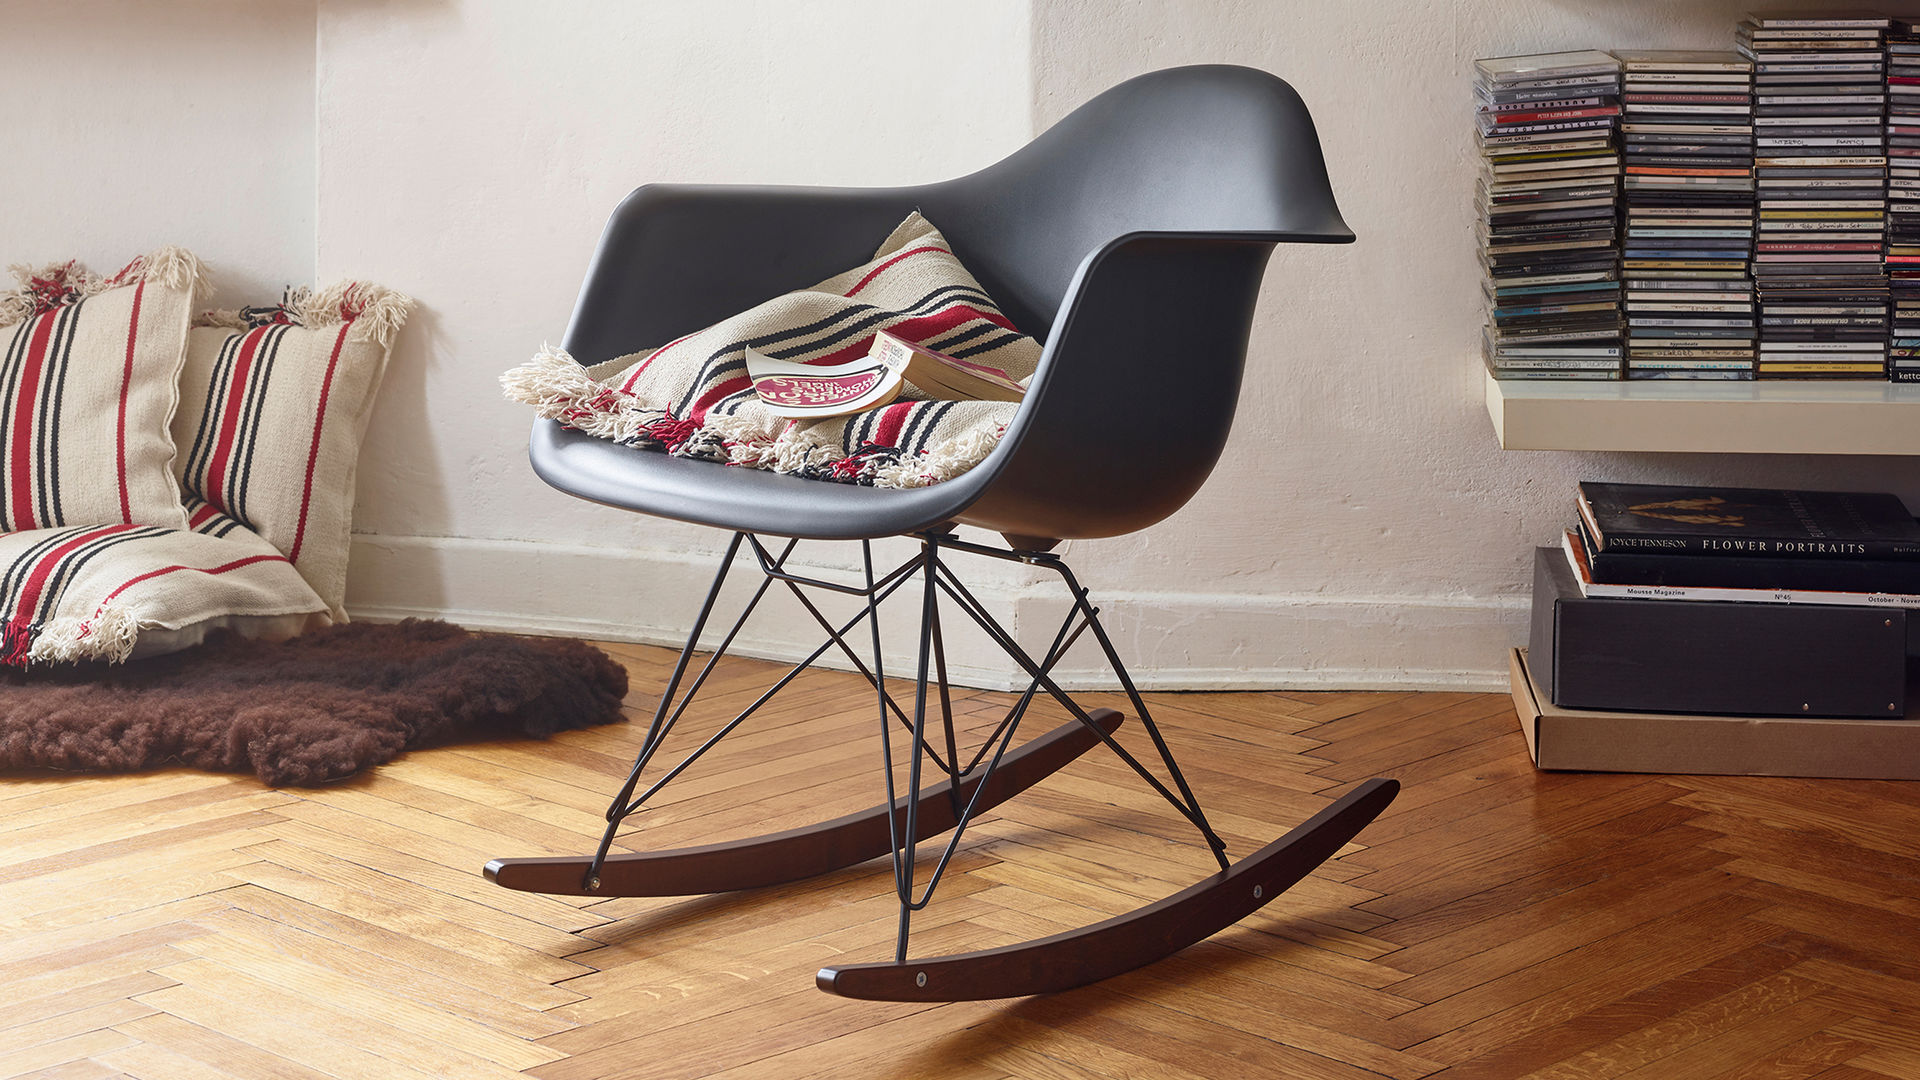 Sedia A Dondolo Rar Eames : Vitra eames plastic armchair rar